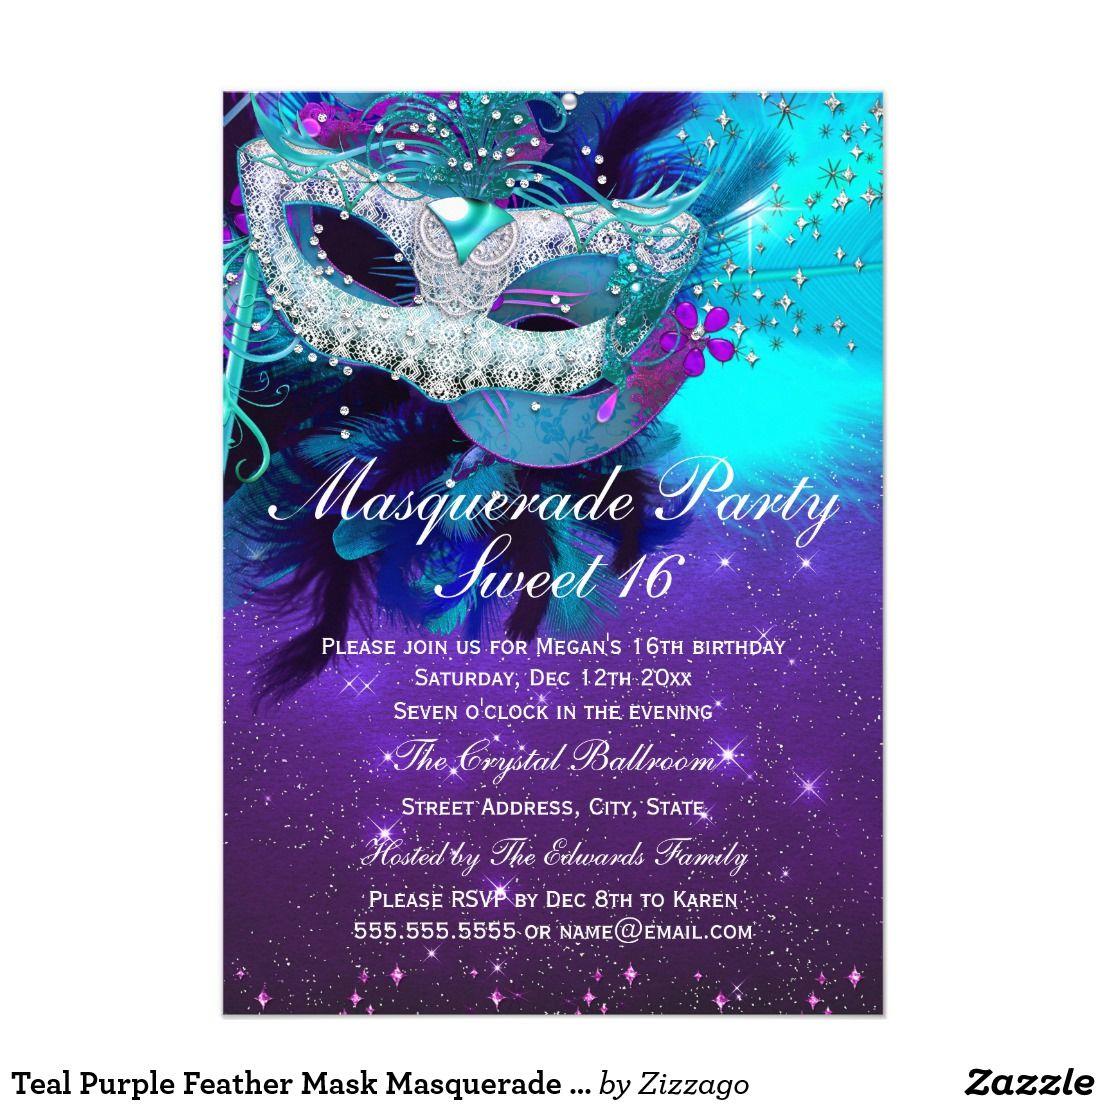 Teal Purple Feather Mask Masquerade Invitation | Purple sweet 16 ...